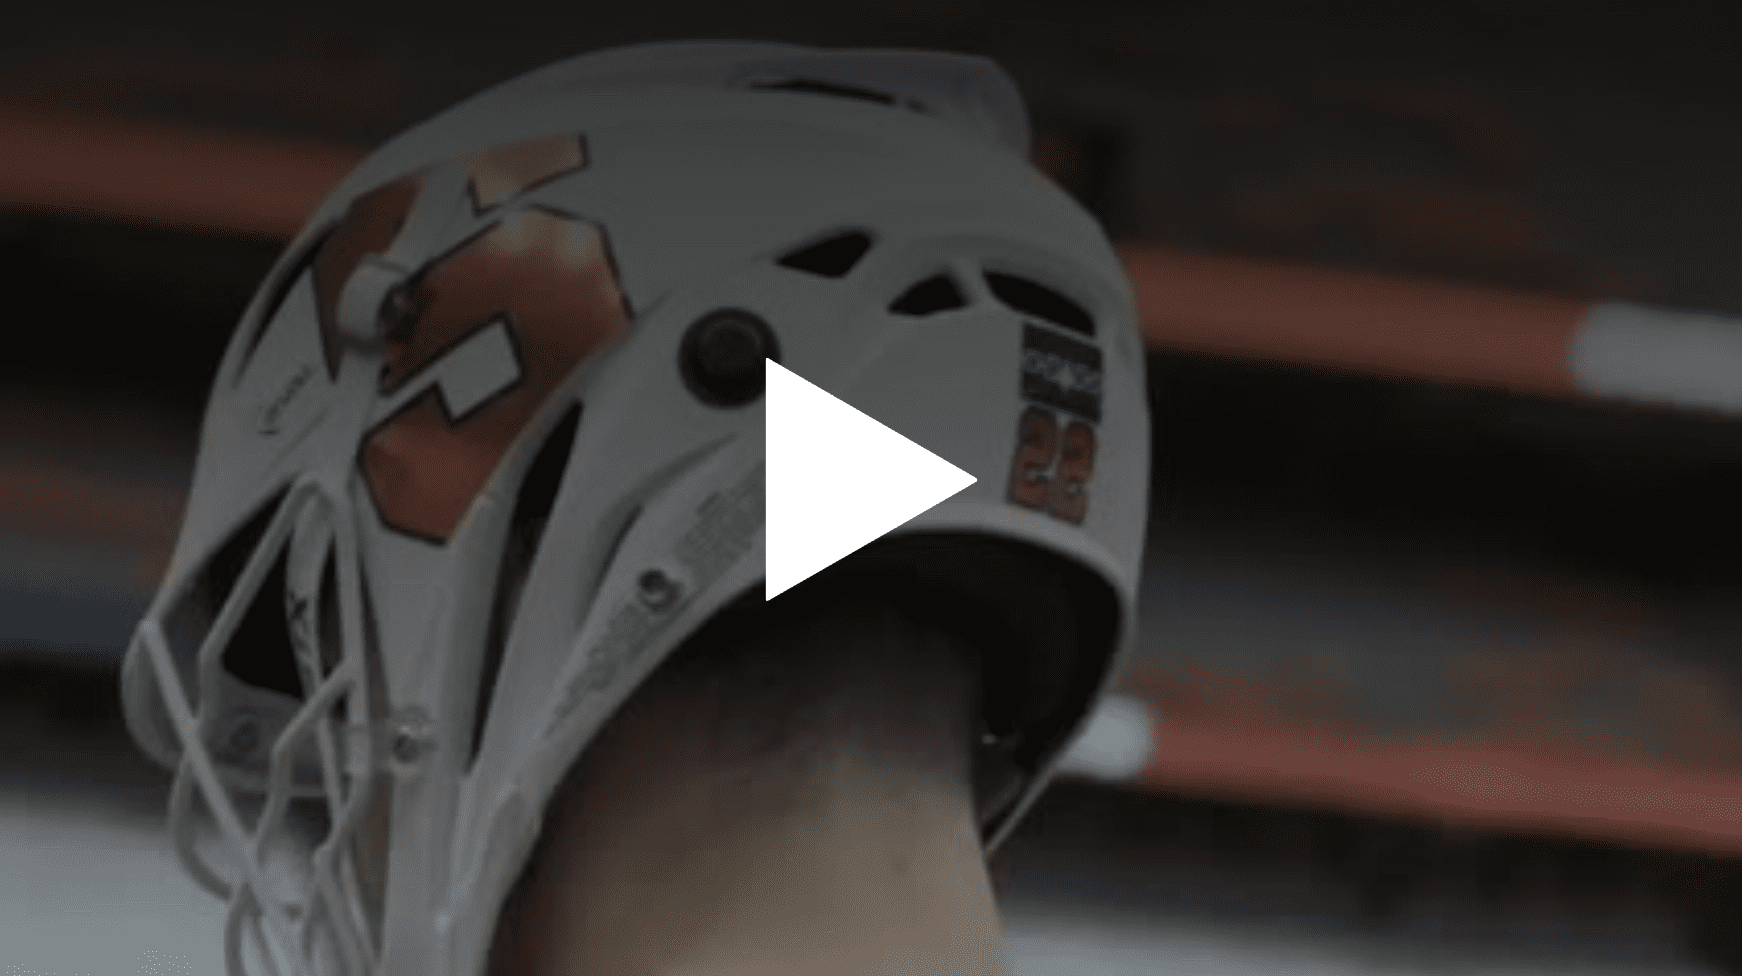 syracuse orange men's lacrosse ncaa d1 college lacrosse